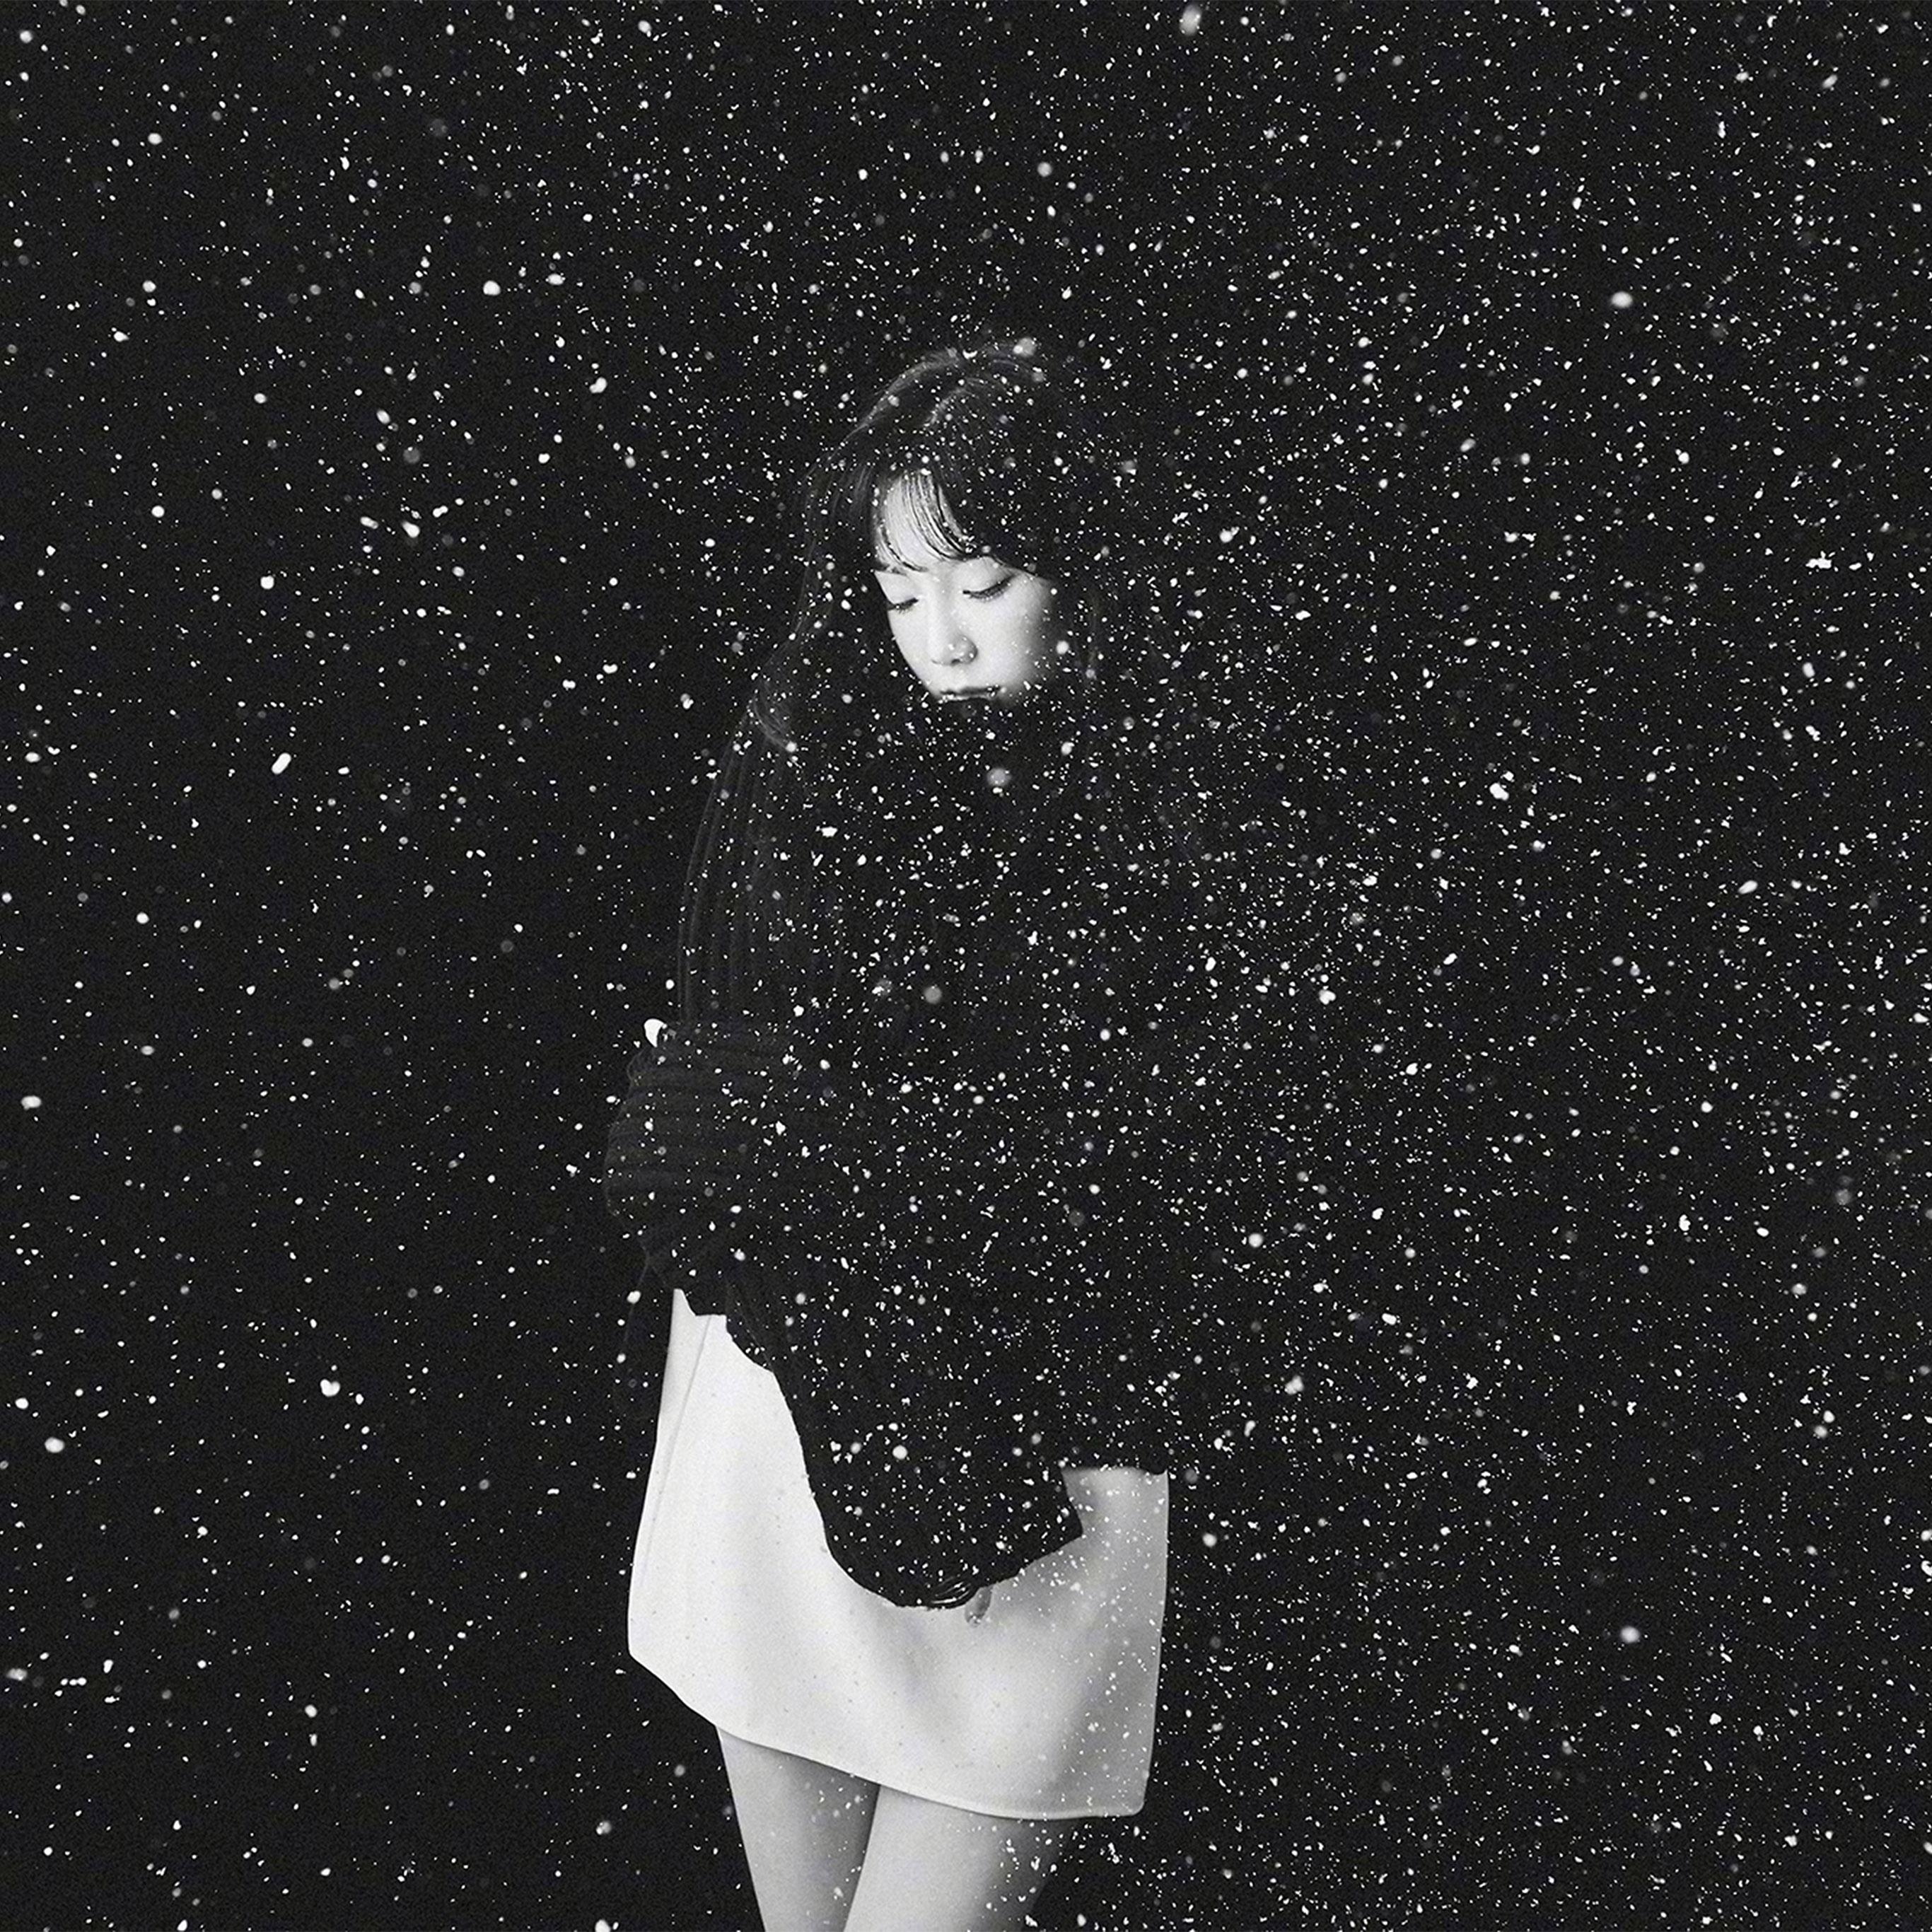 Ho98 Snow Girl Snsd Taeyeon Black Bw Kpop Wallpaper